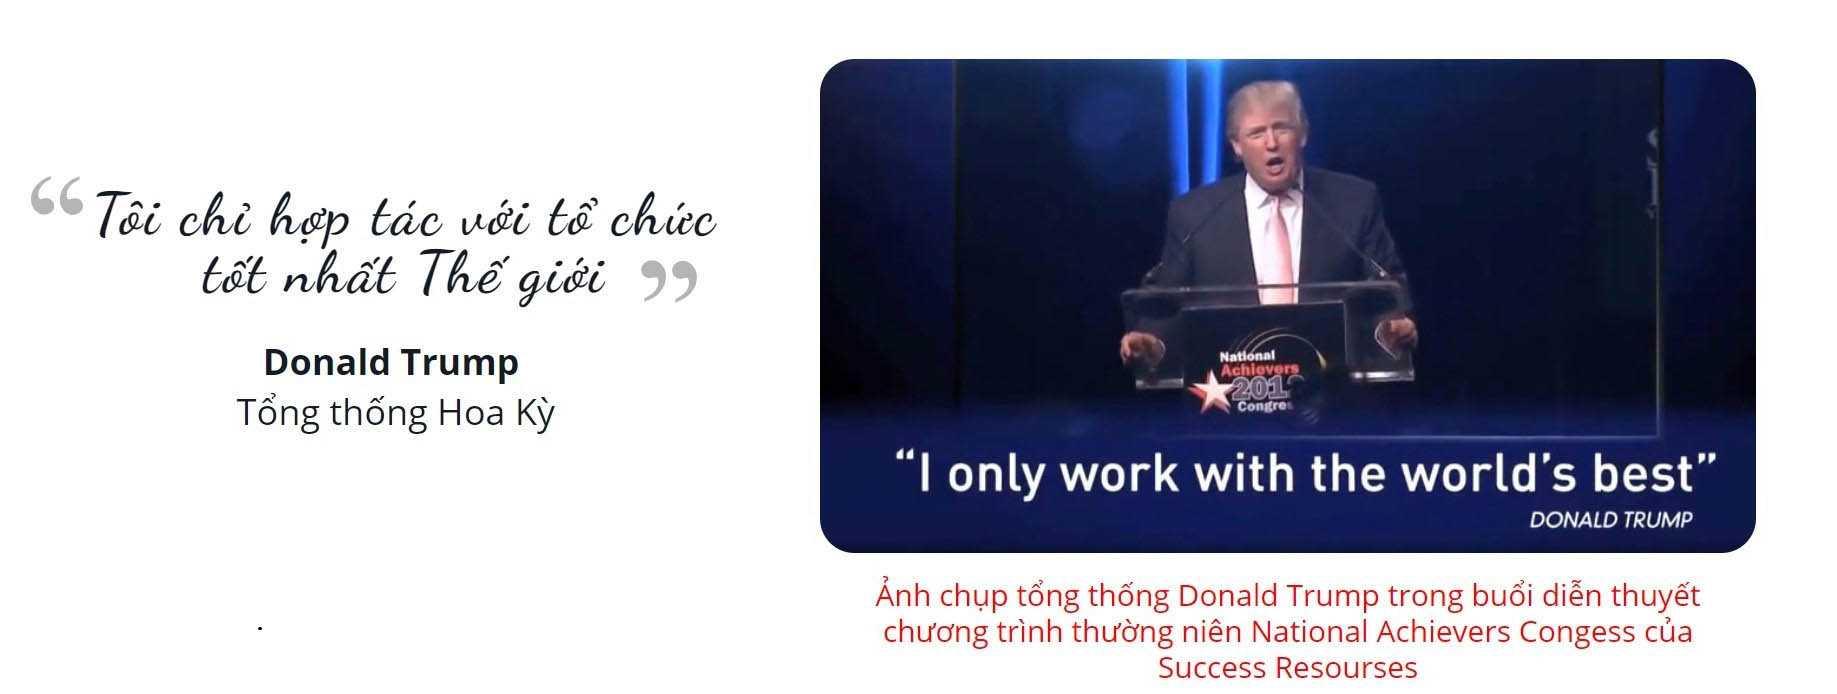 Tấm hình trên Myaladdinz.vn